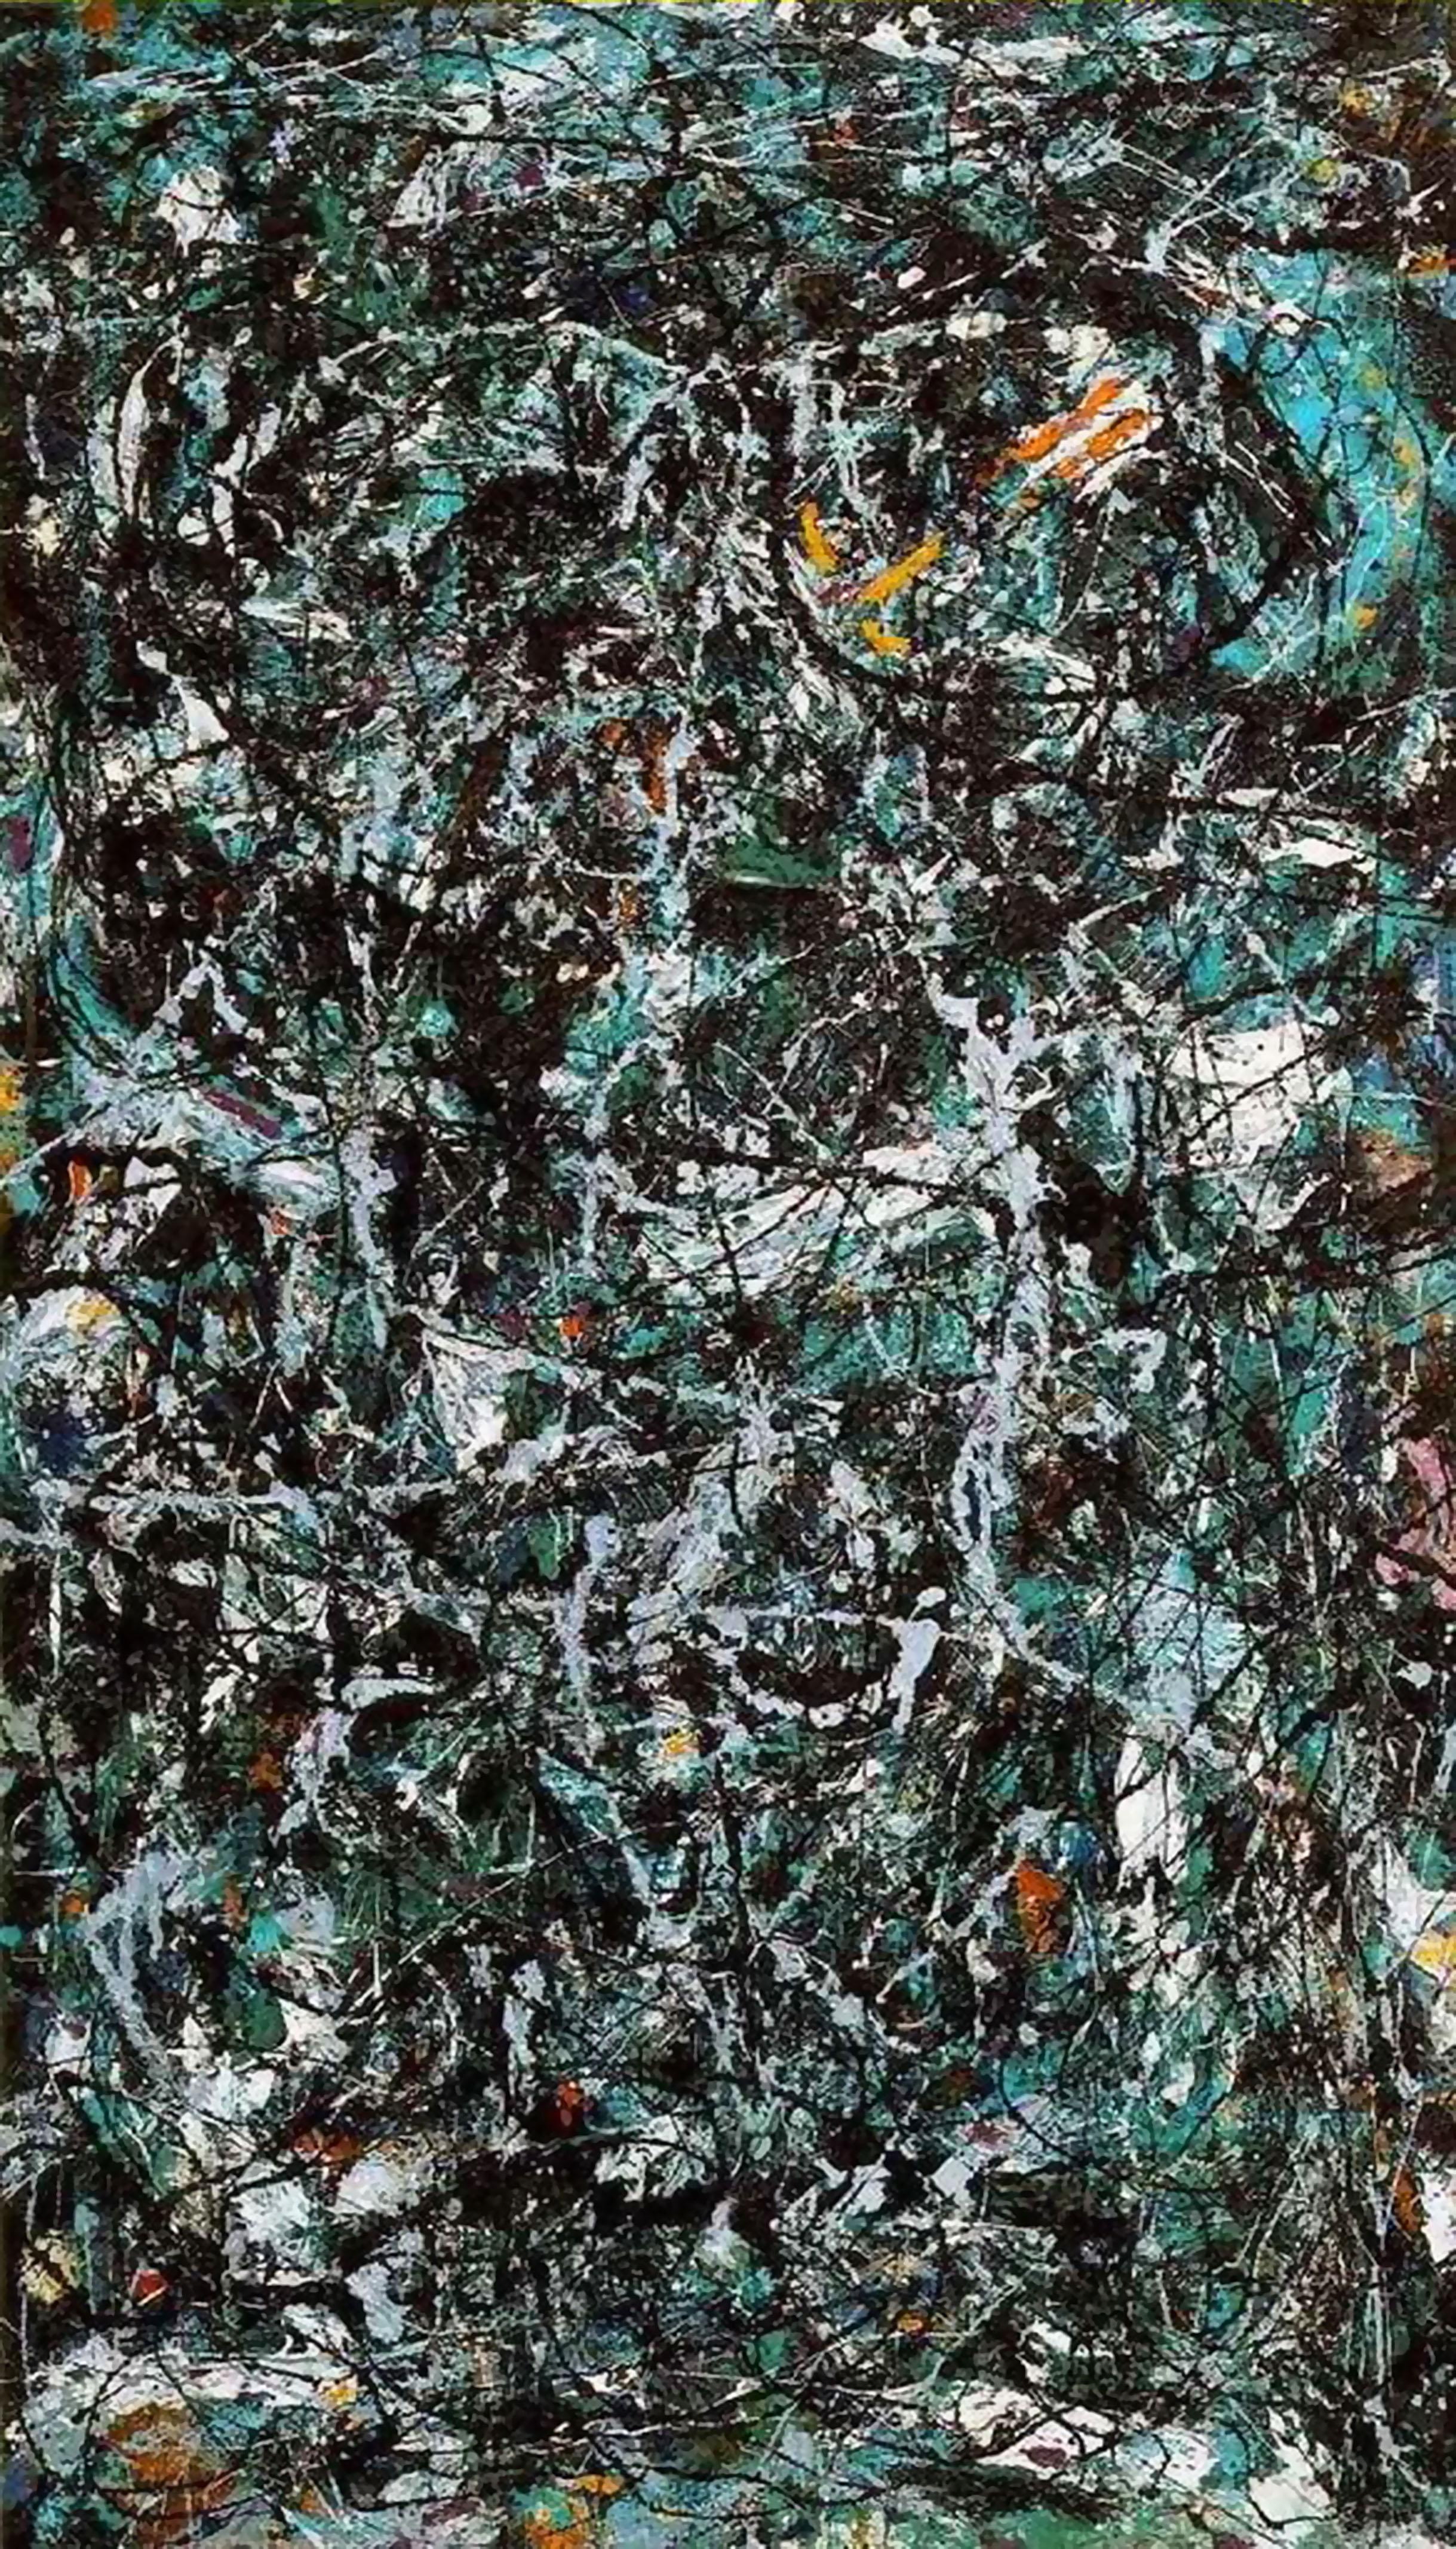 Pollock_FullFathomFive_1947sm